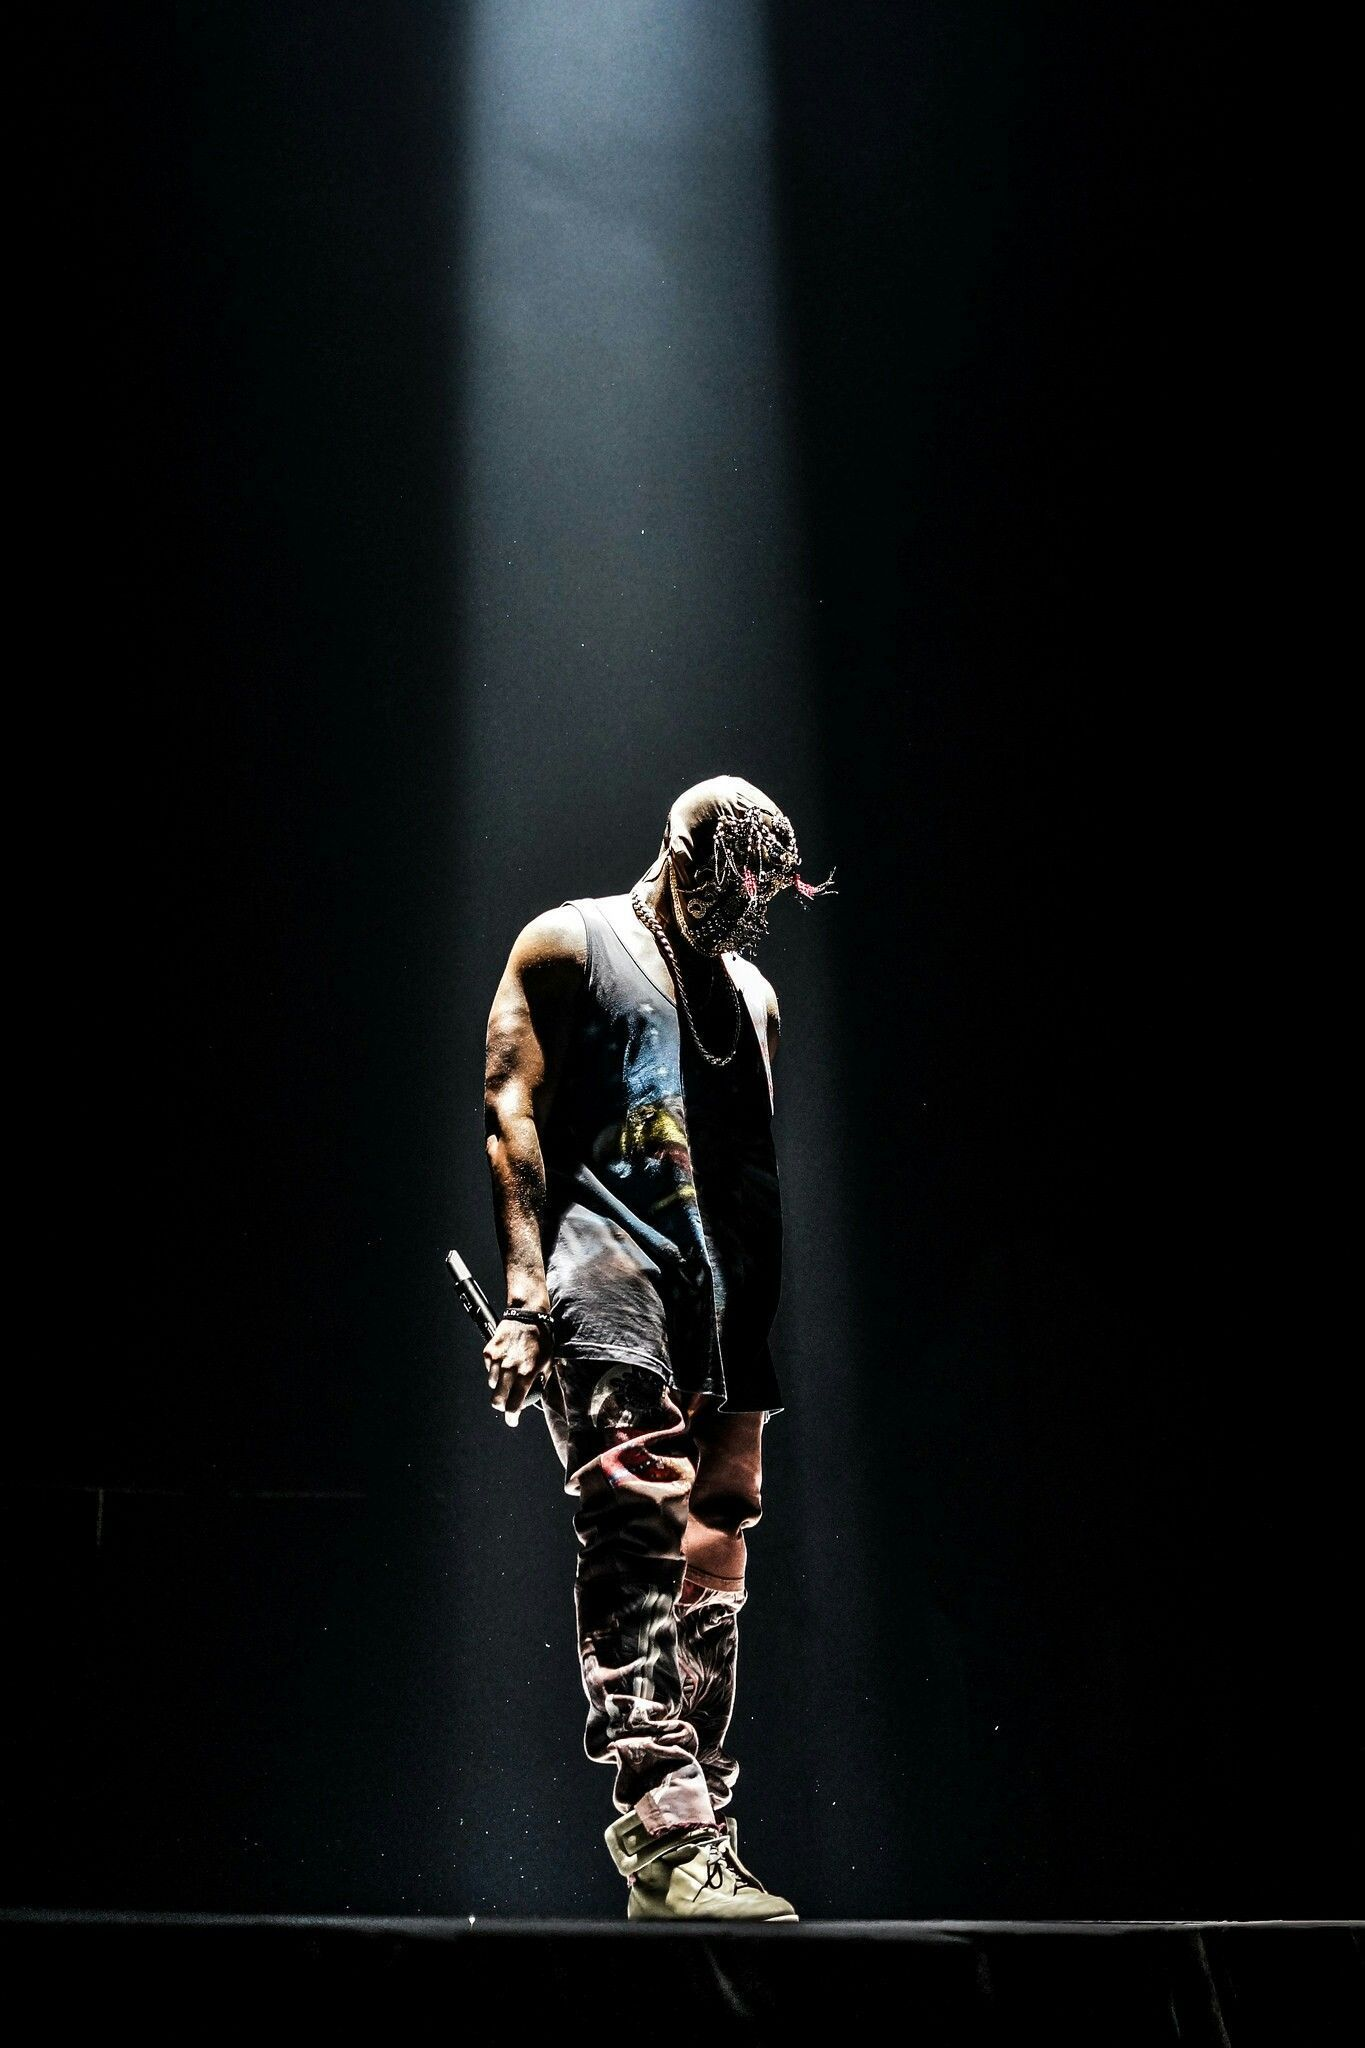 Kanye West Yeezus Tour Kanye West Wallpaper Kanye West Yeezus Yeezus Tour